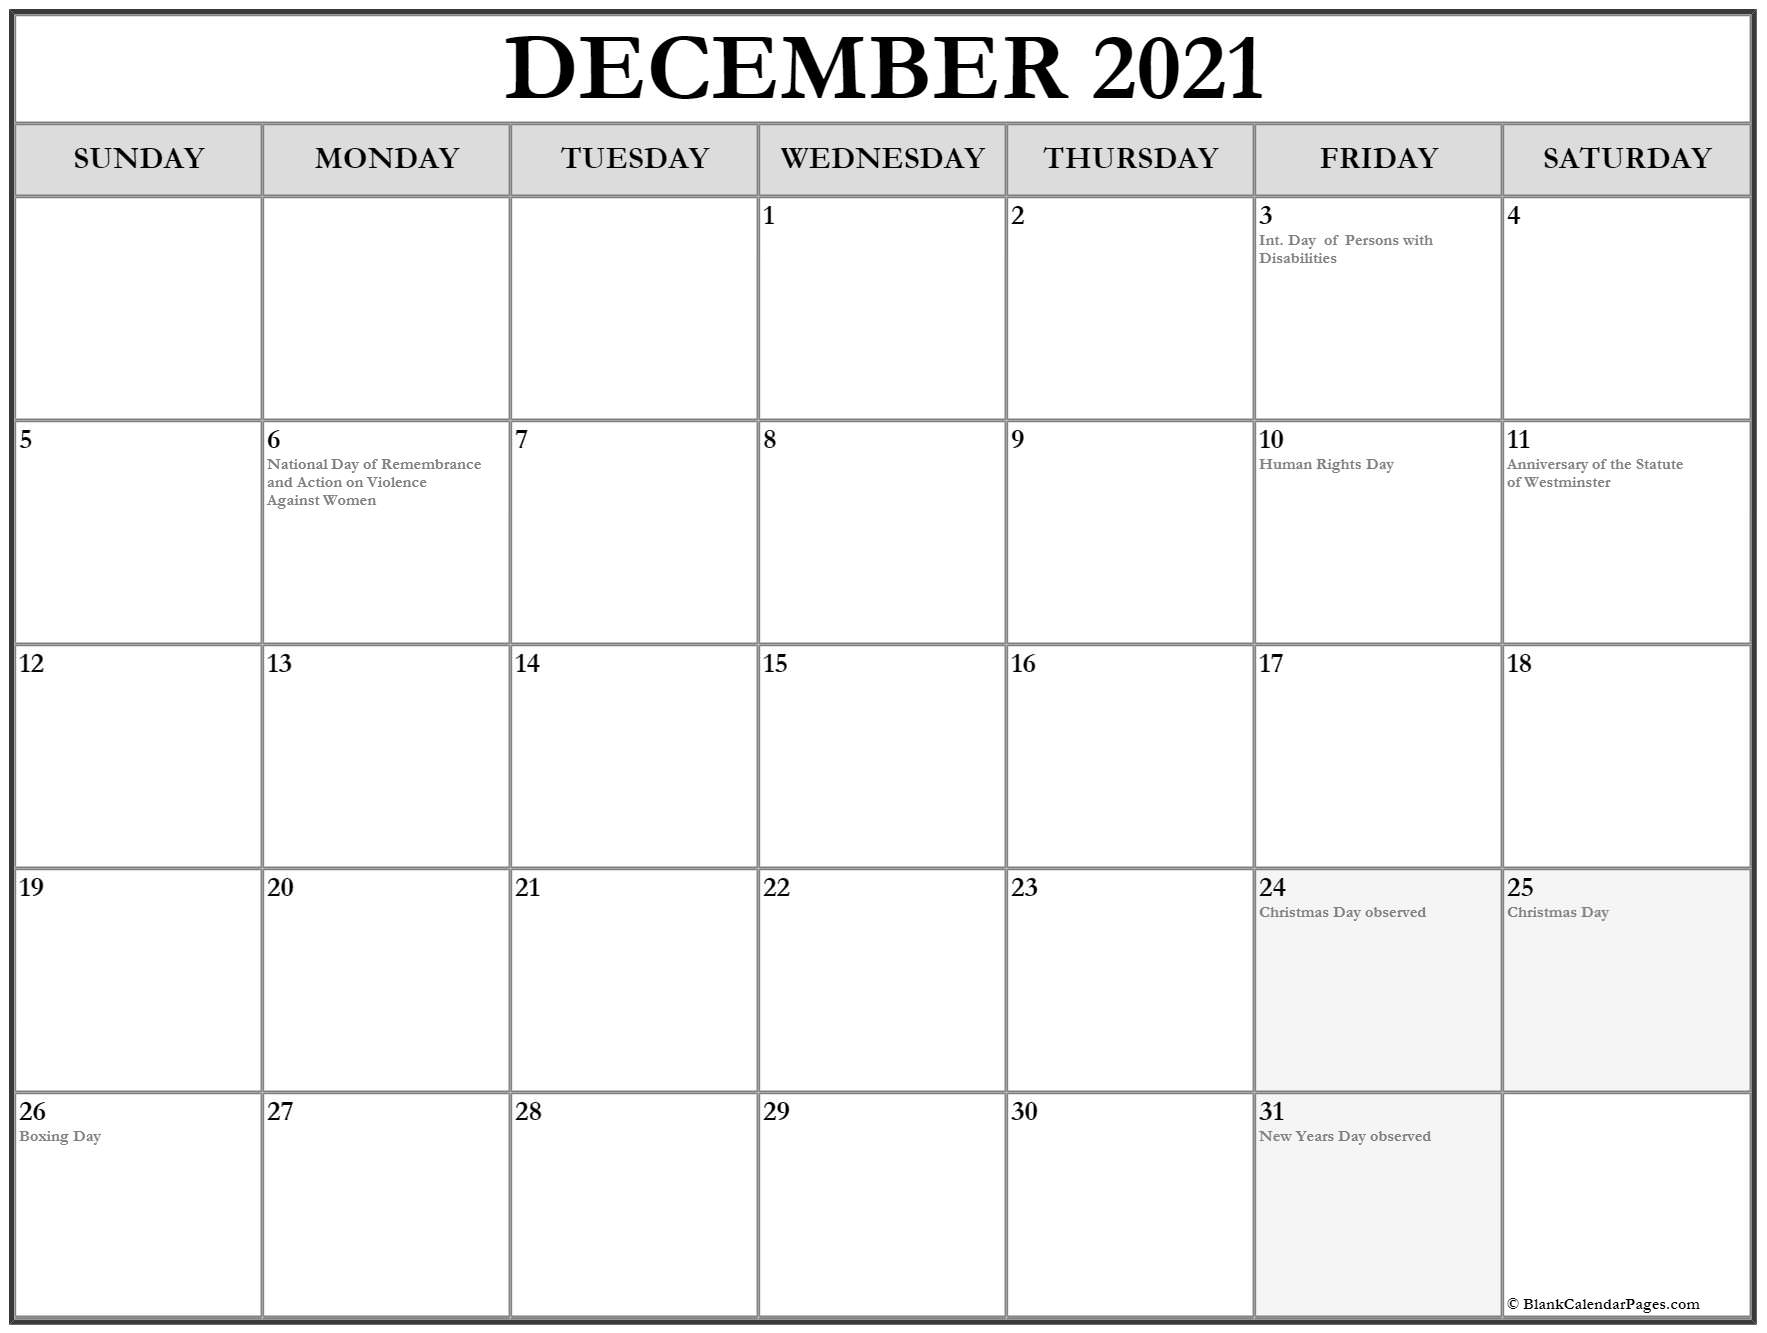 December 2021 With Holidays Calendar